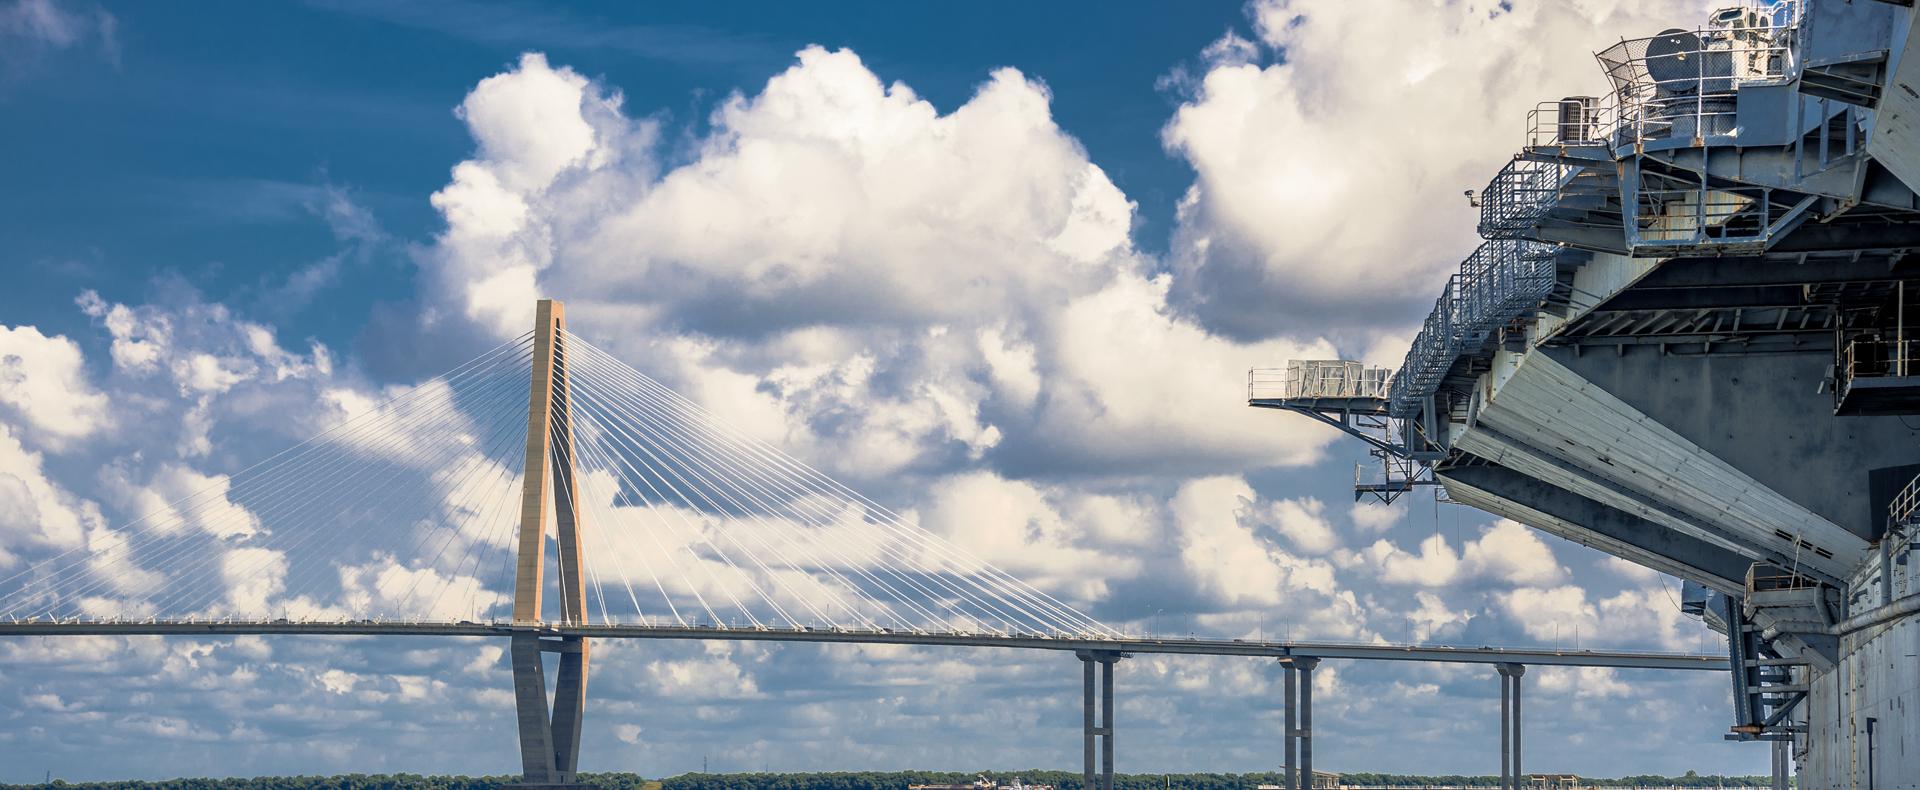 Arthur Ravenel Jr. Bridge and USS Yorktown in Charleston SC Image